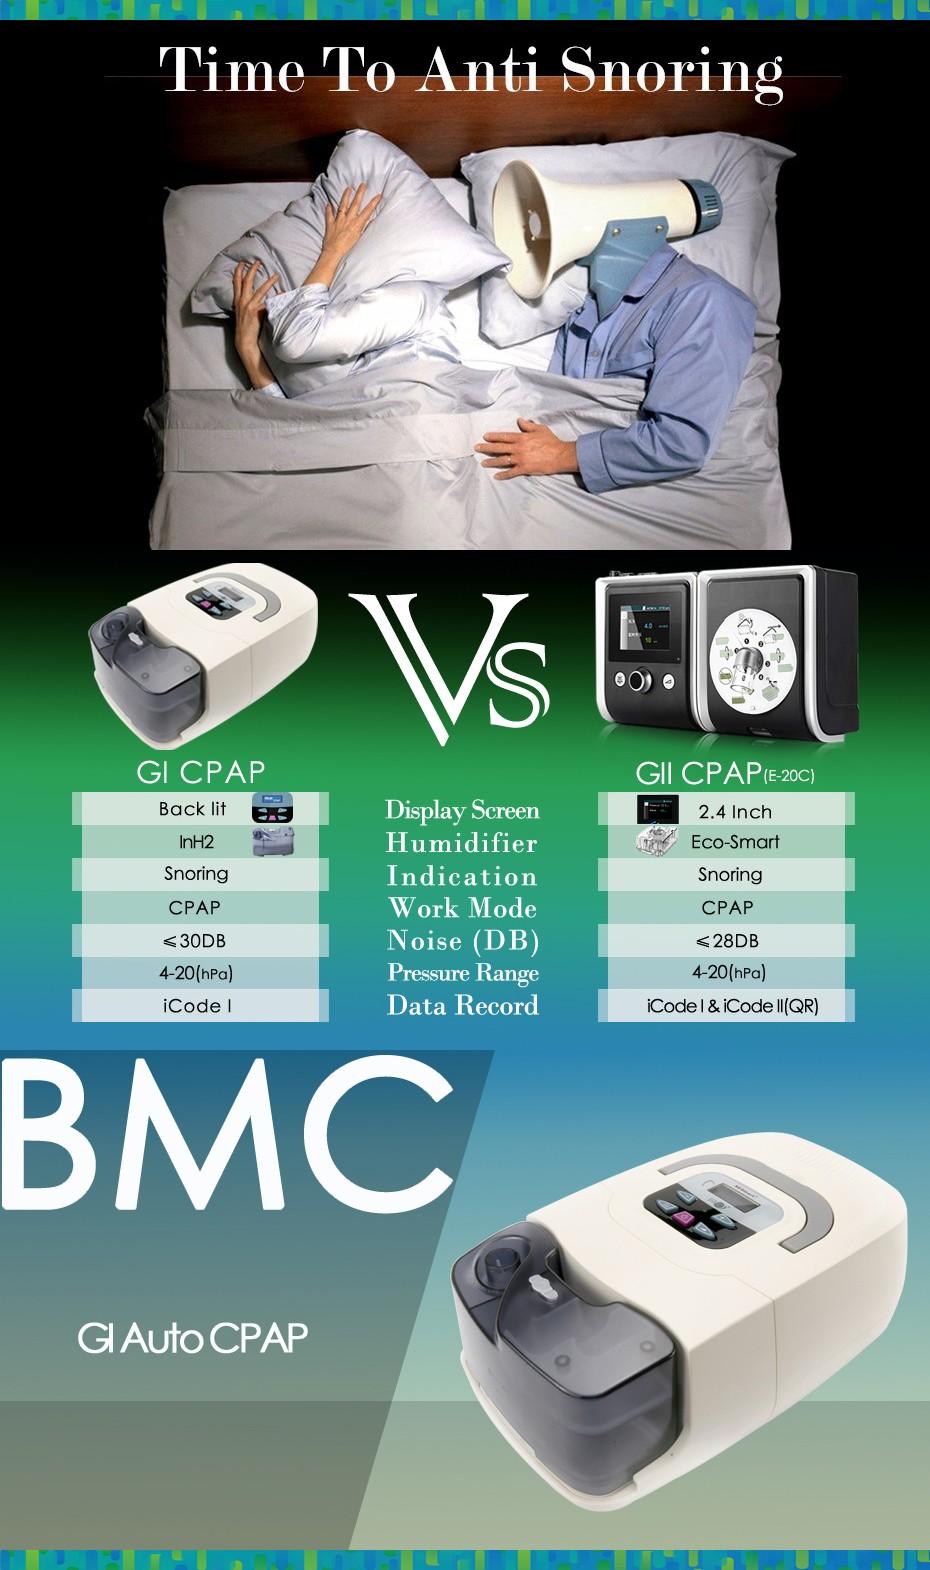 Doctoddd GI CPAP Portable CPAP Respirator for Anti Snoring Sleep Apnea OSAHS OSAS W Nasal Mask Headgear Tube Bag User Manual (26)